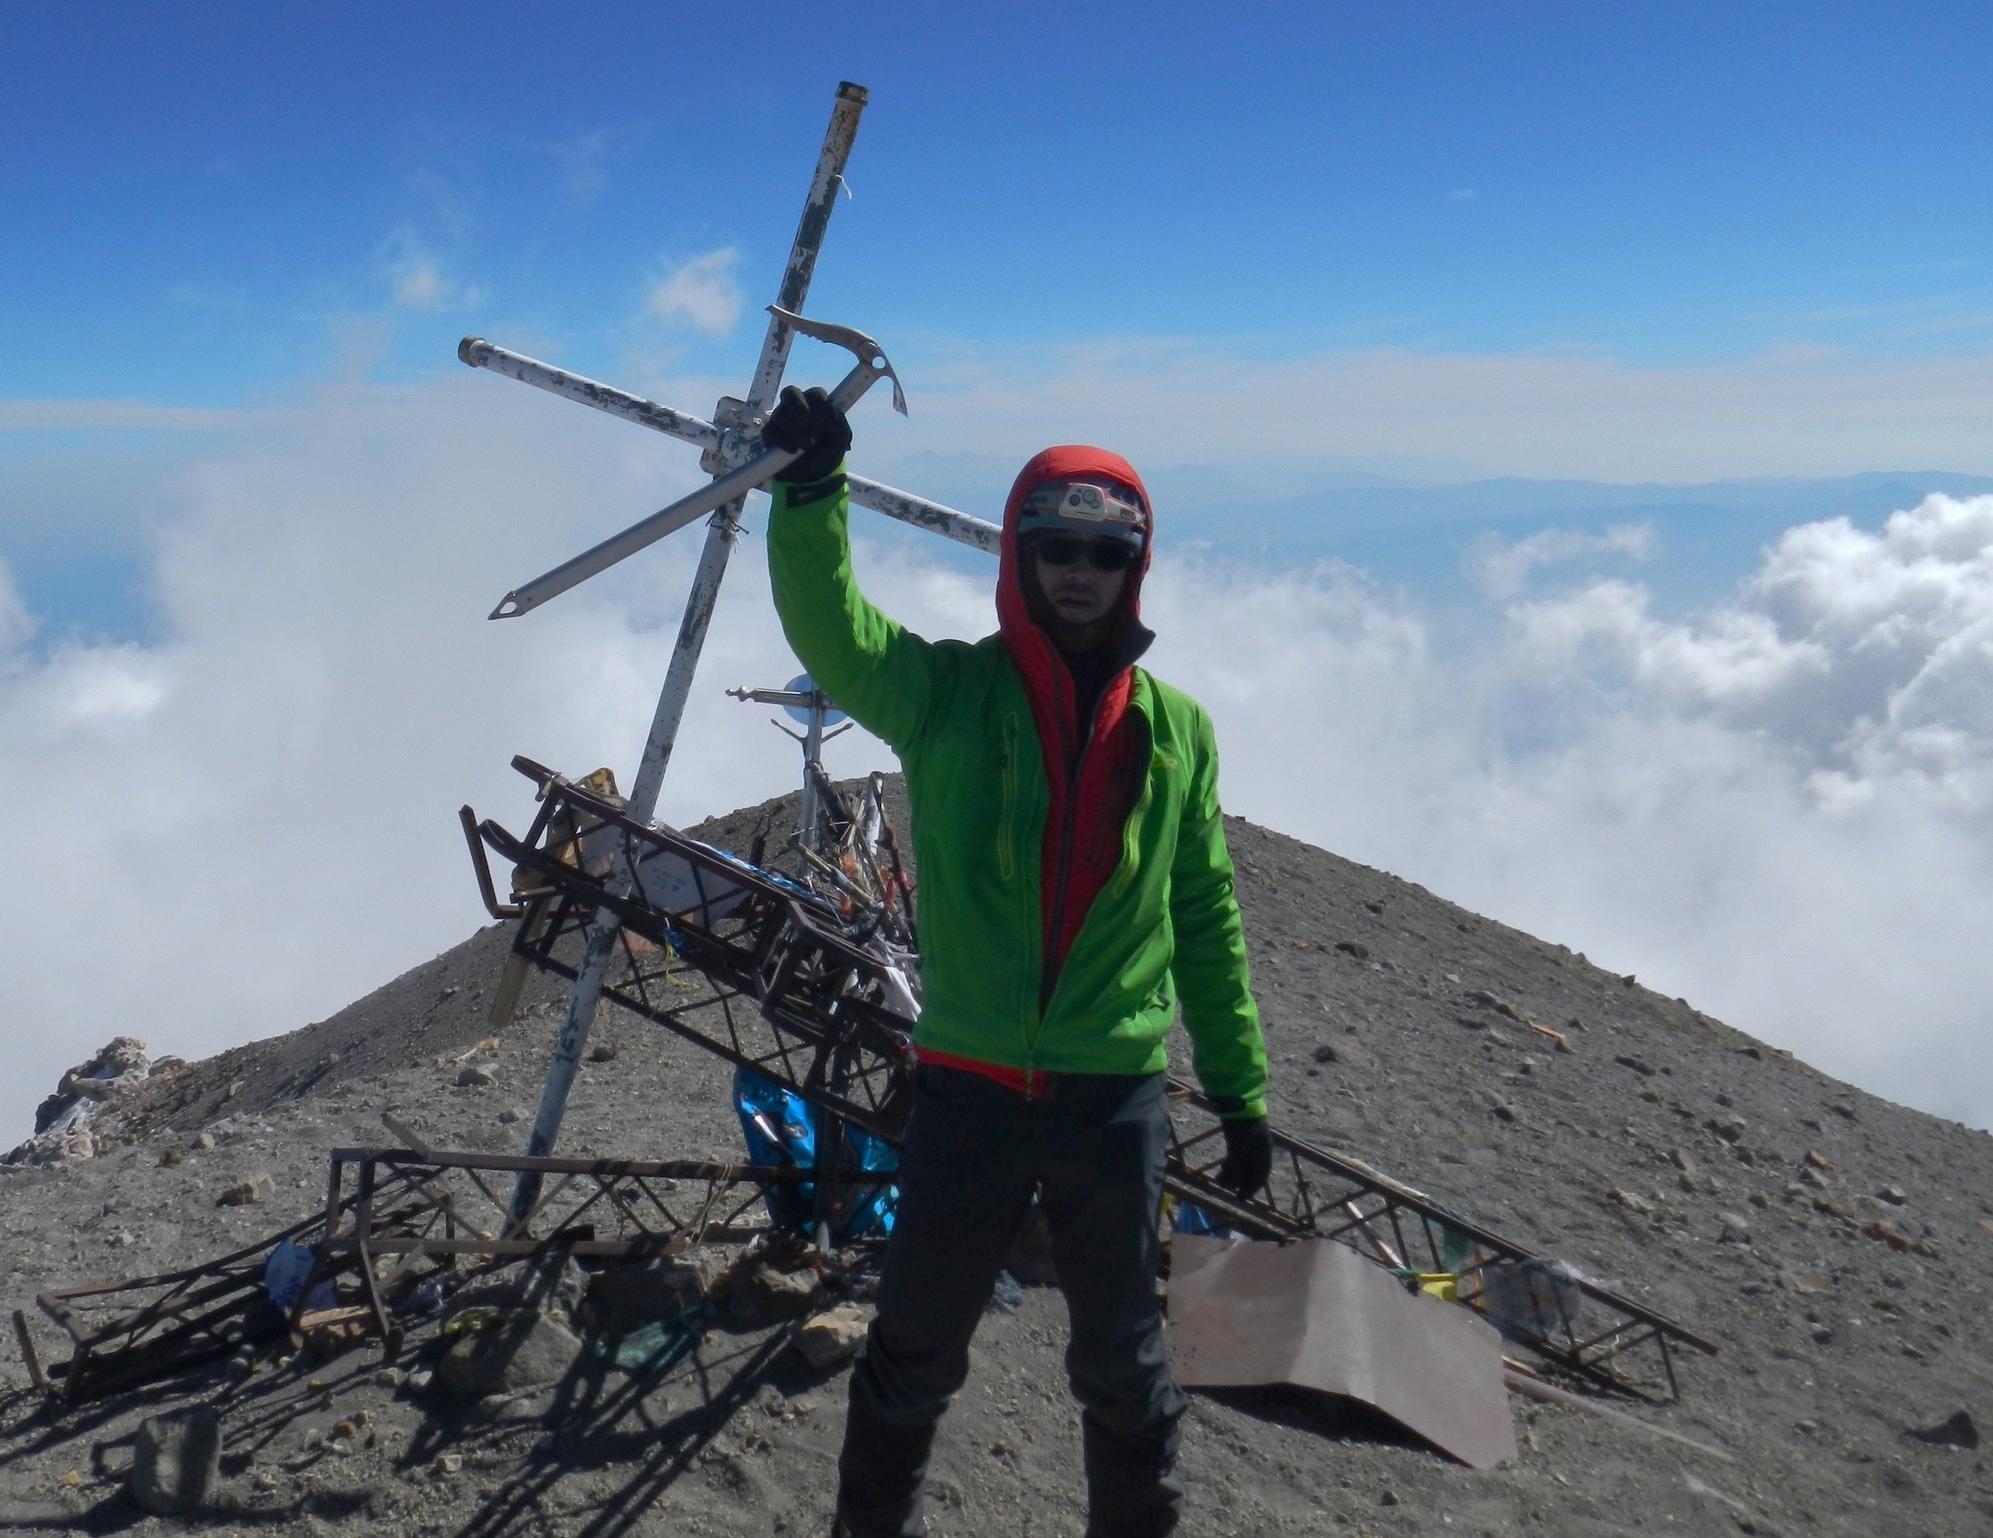 The Summit of Orizaba. Photo credit: John Wallingford.